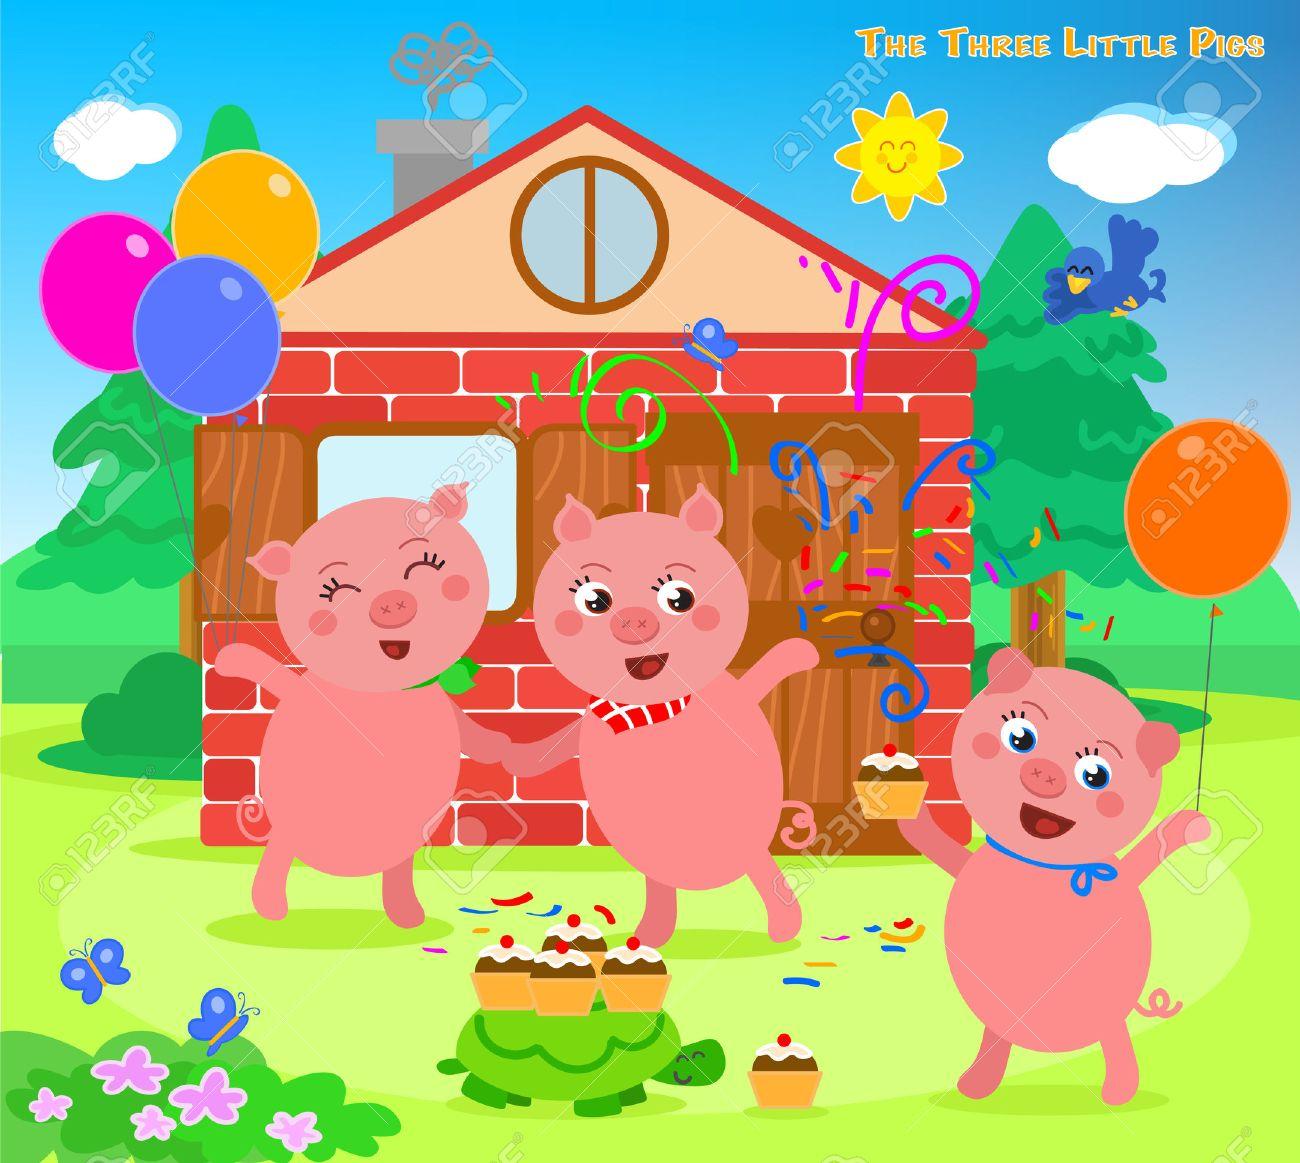 The three little pigs folktale happy ending - 54421184